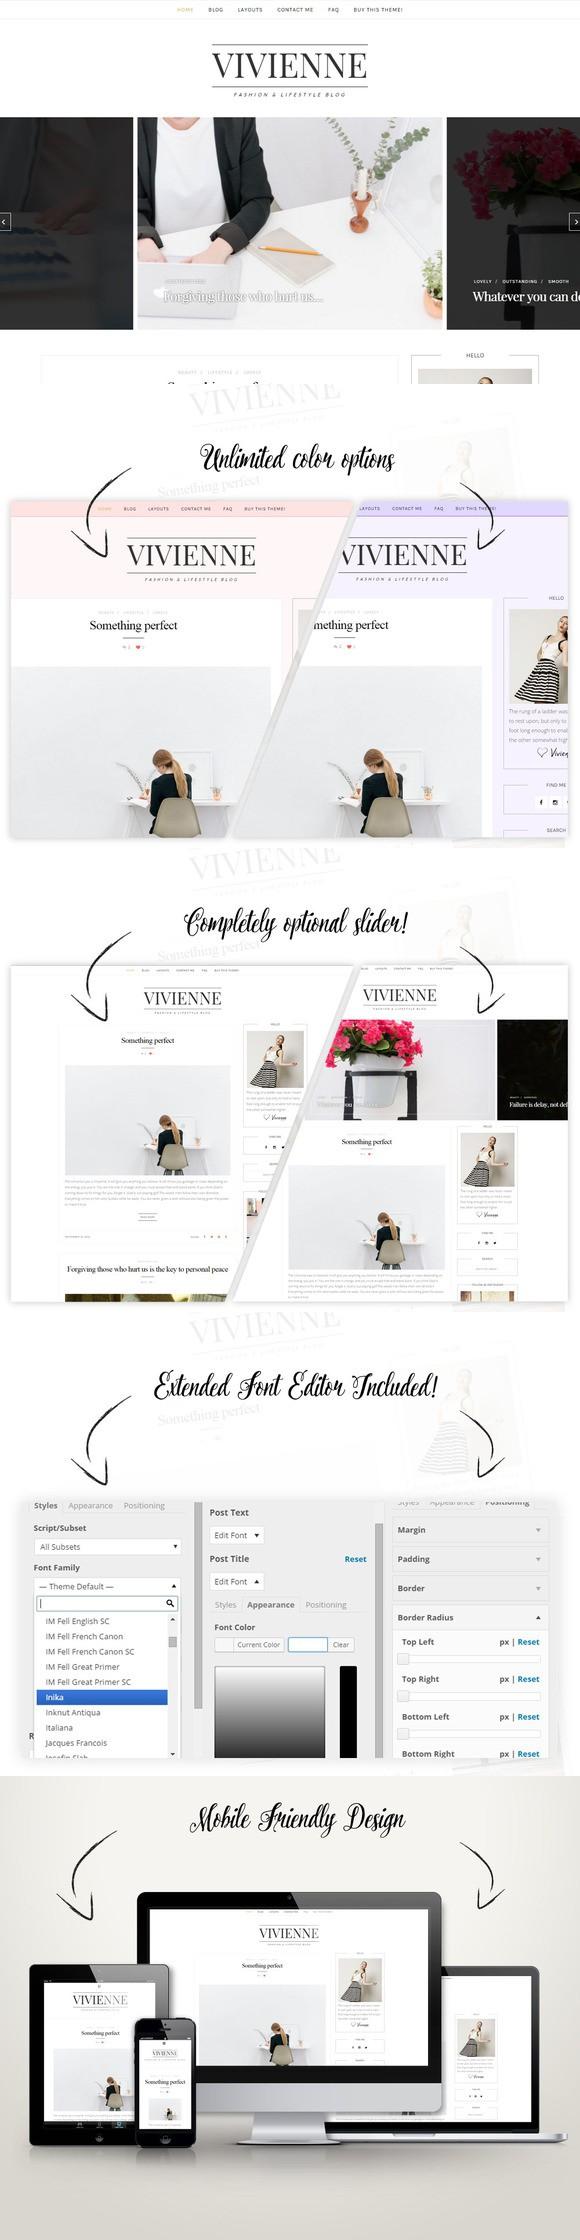 Classic Wordpress Theme Vivienne Blog Themes Wordpress